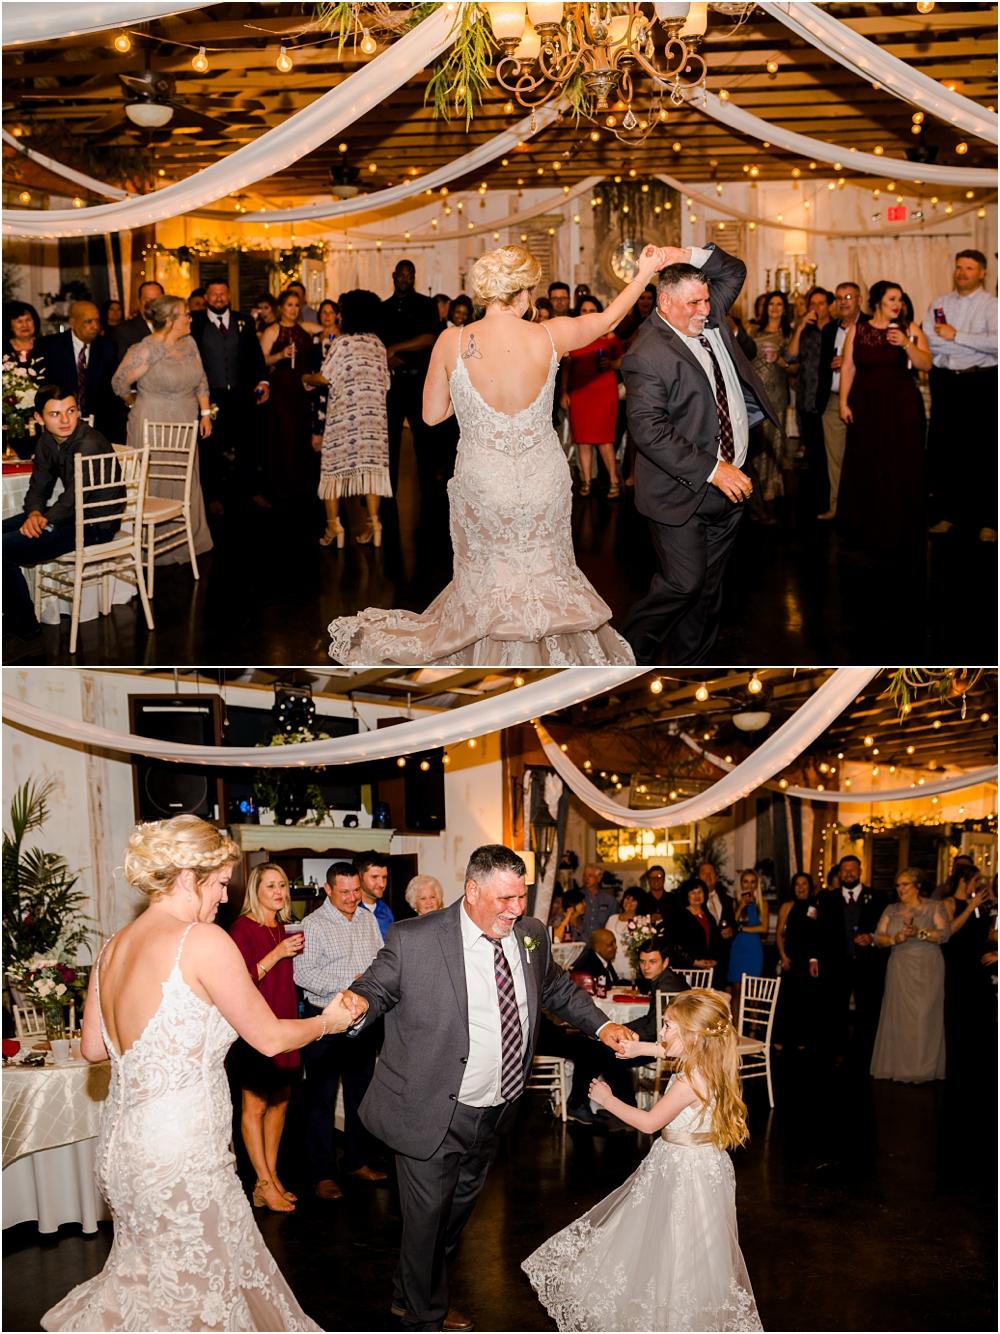 baton-rouge-gabrielle-house-wedding-kiersten-stevenson-photography-156.jpg